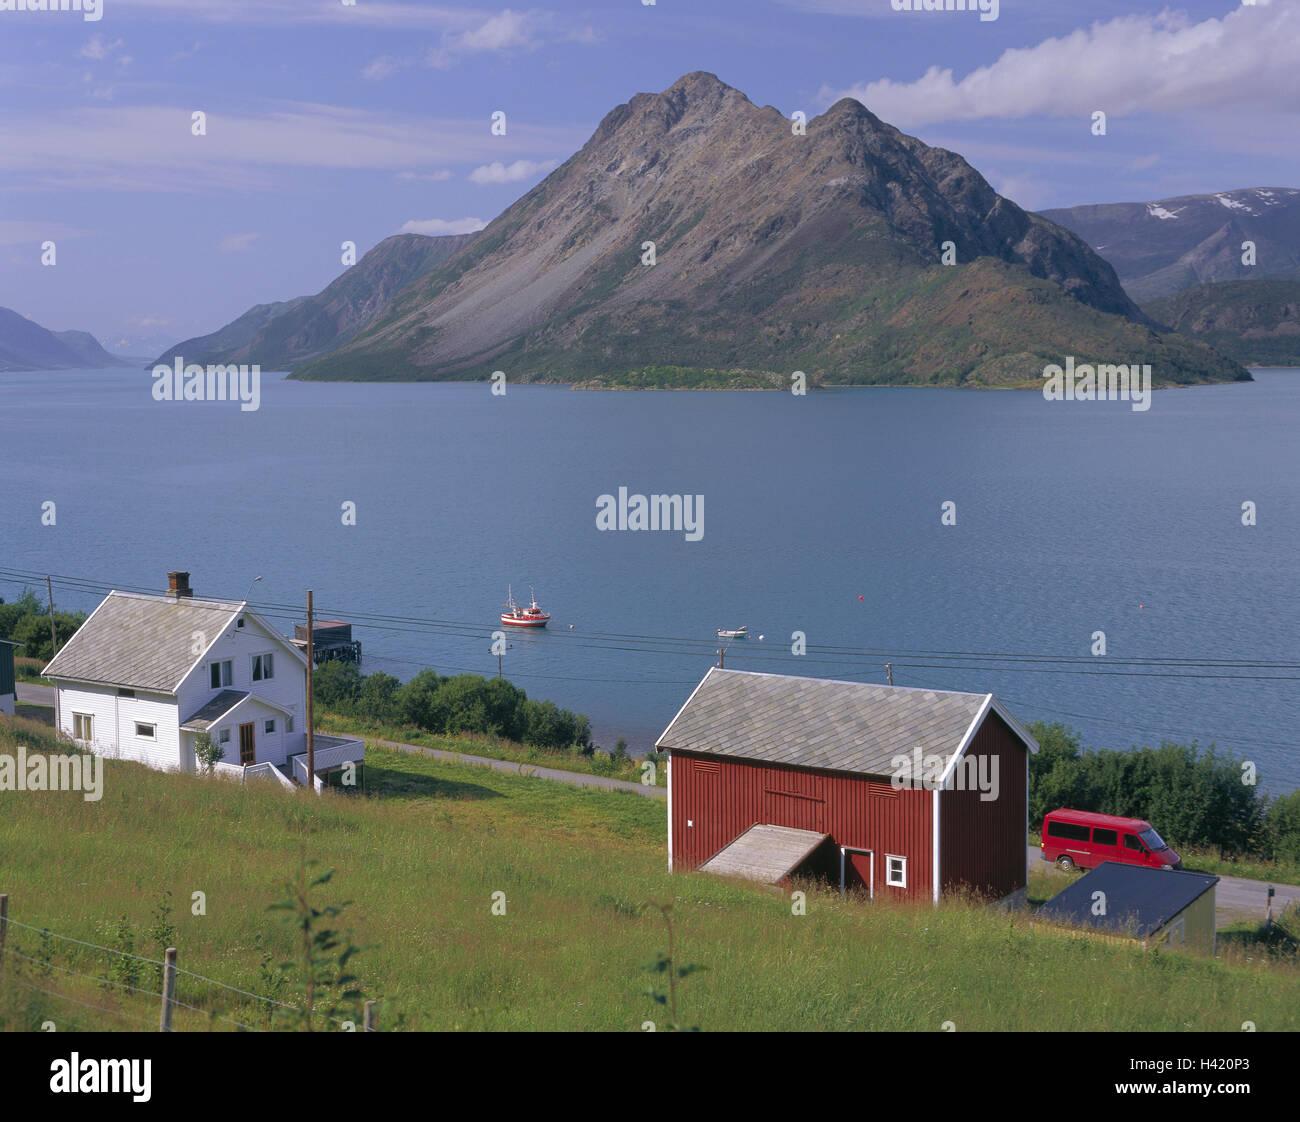 Norwegen, Troms, Fjord, Angeln, Boot, Ufer, Holz Häuser, Europa ...